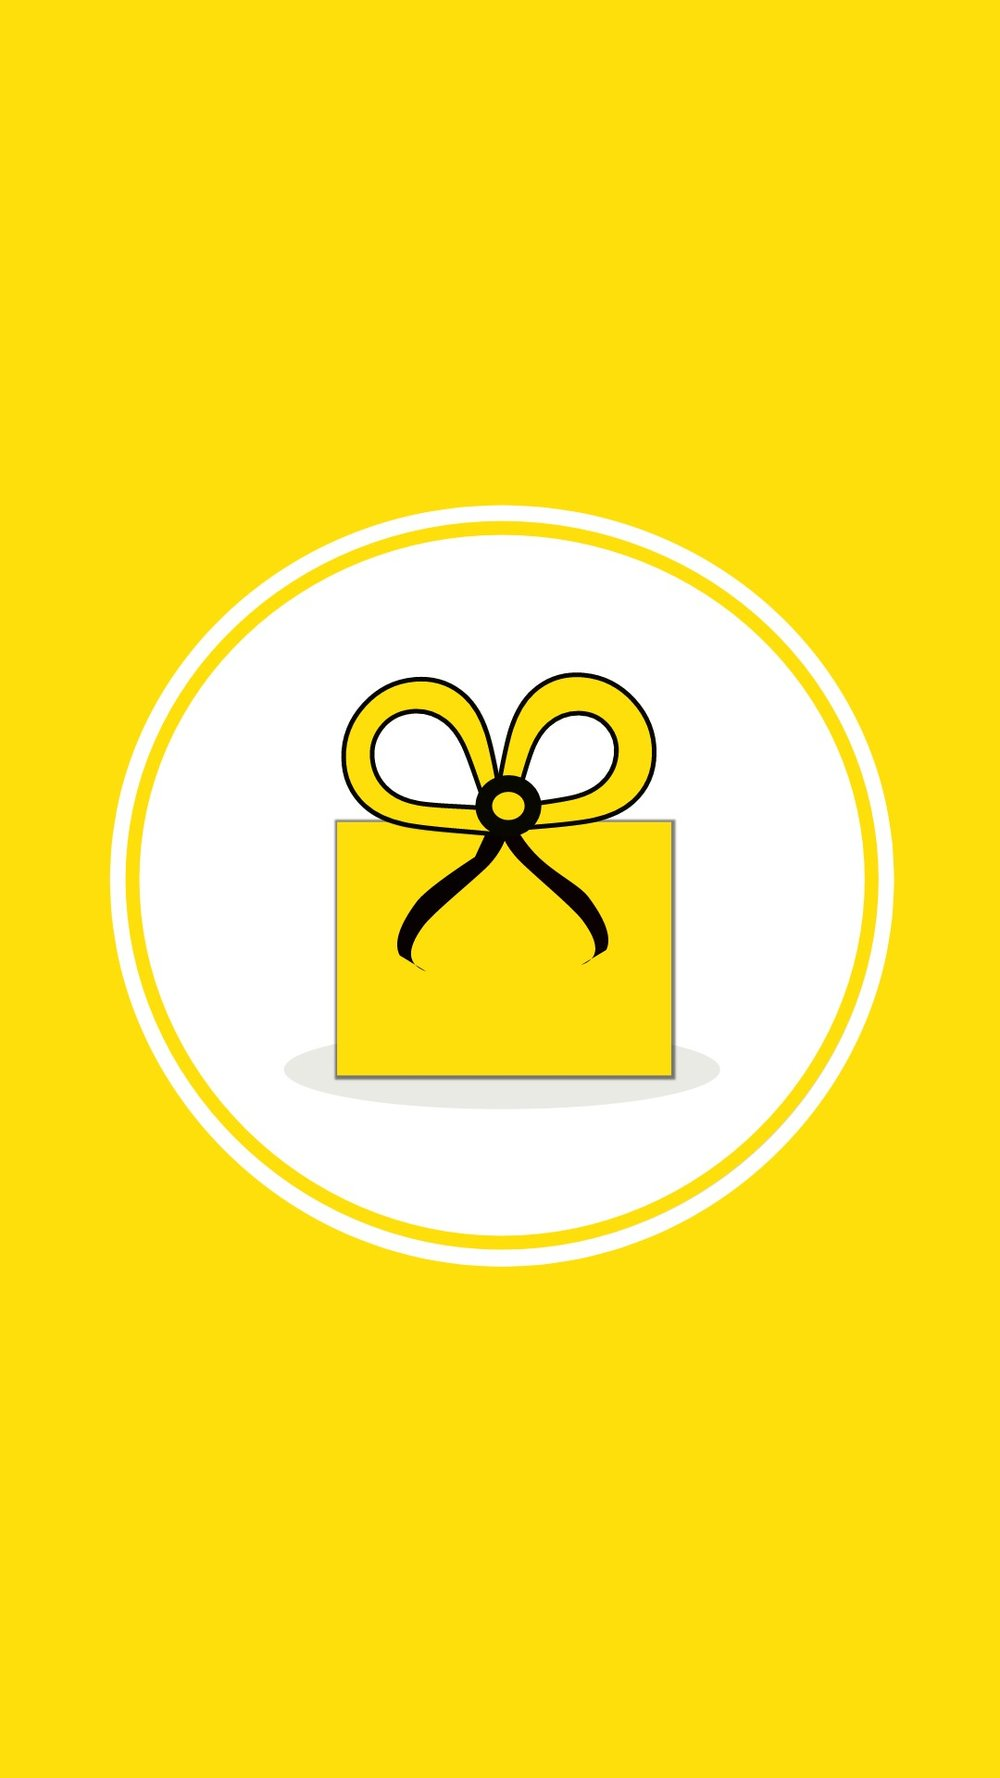 Instagram-cover-box-yellow-lotnotes.com.jpg